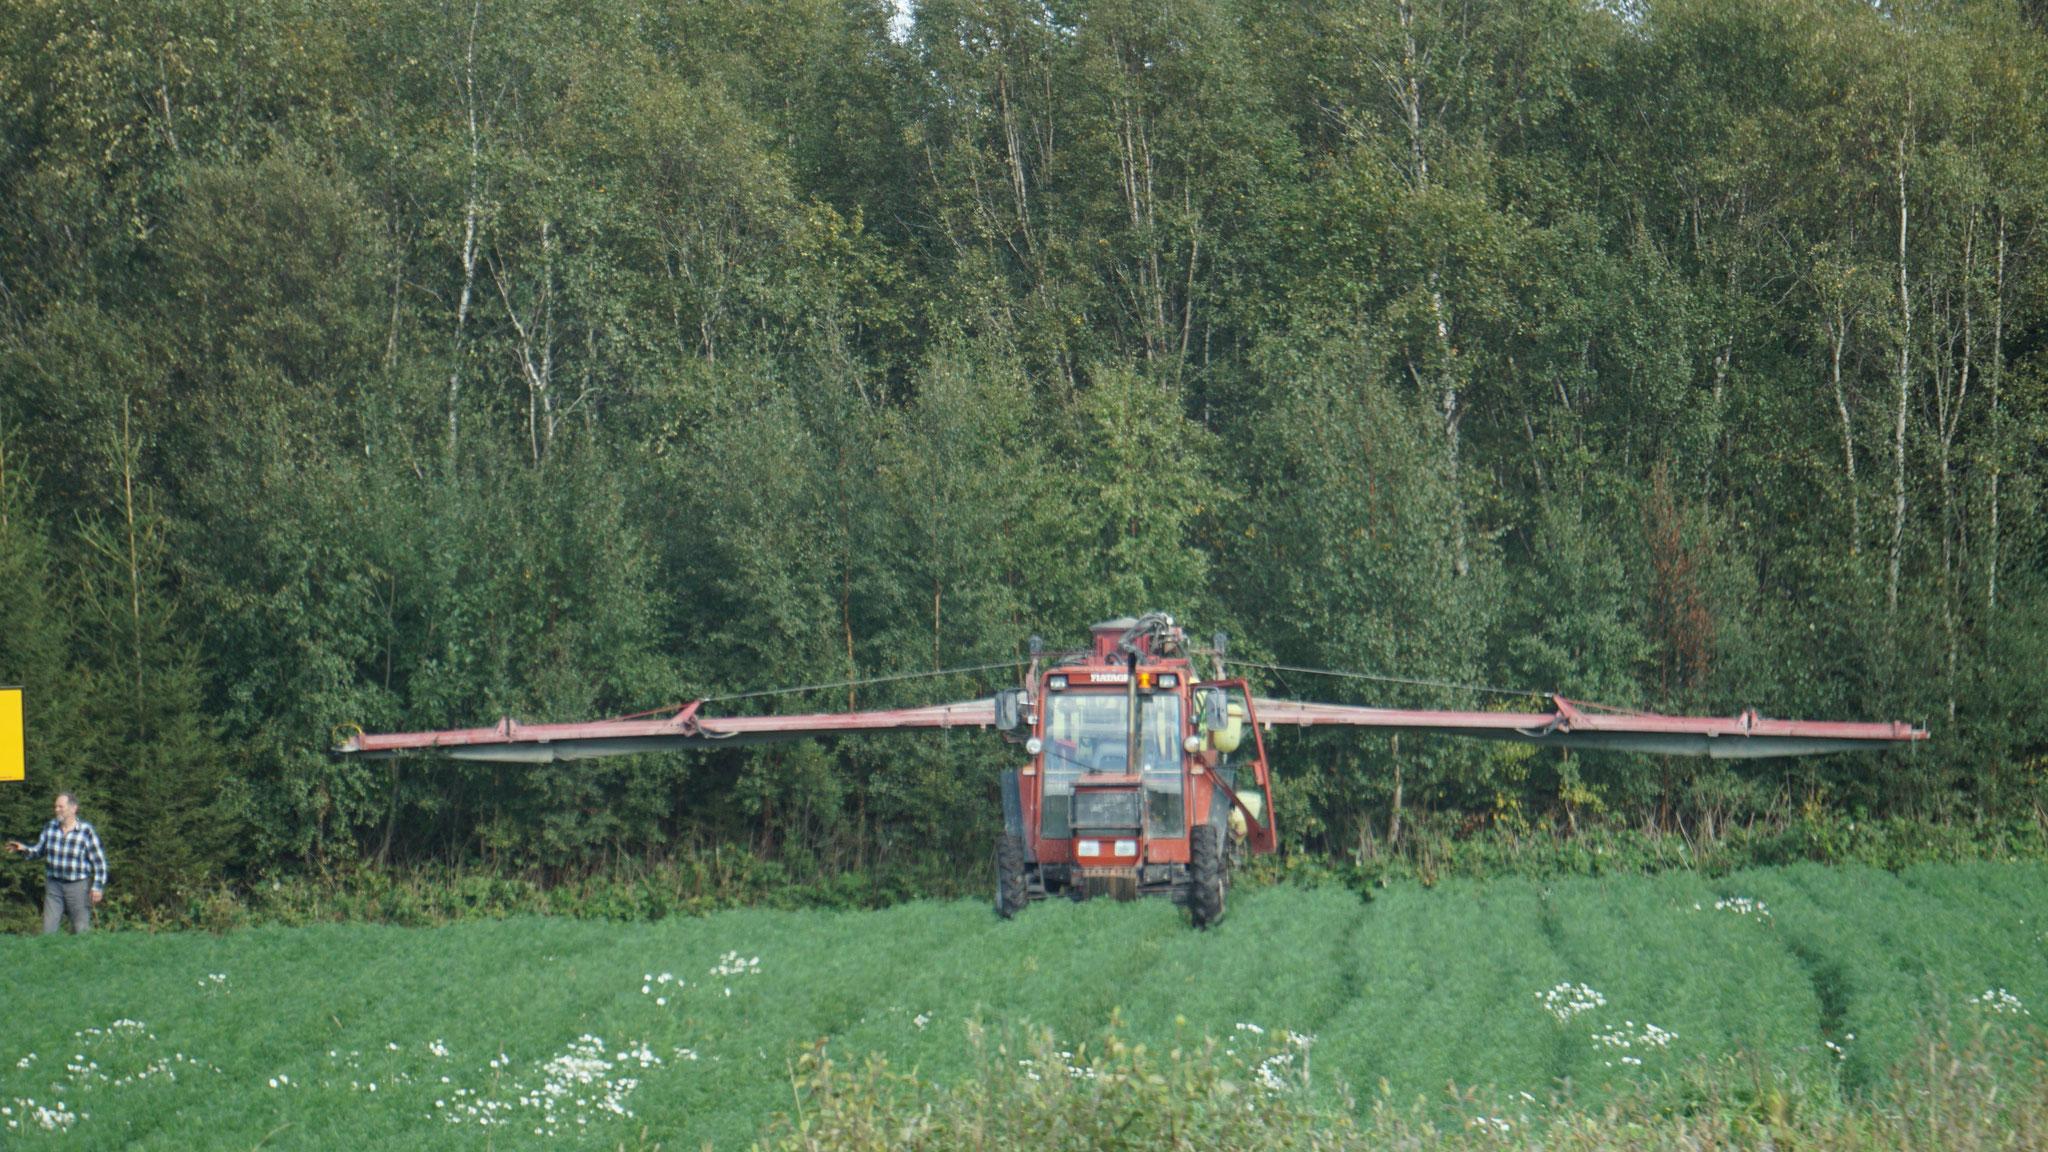 Flugzeug oder Traktor?